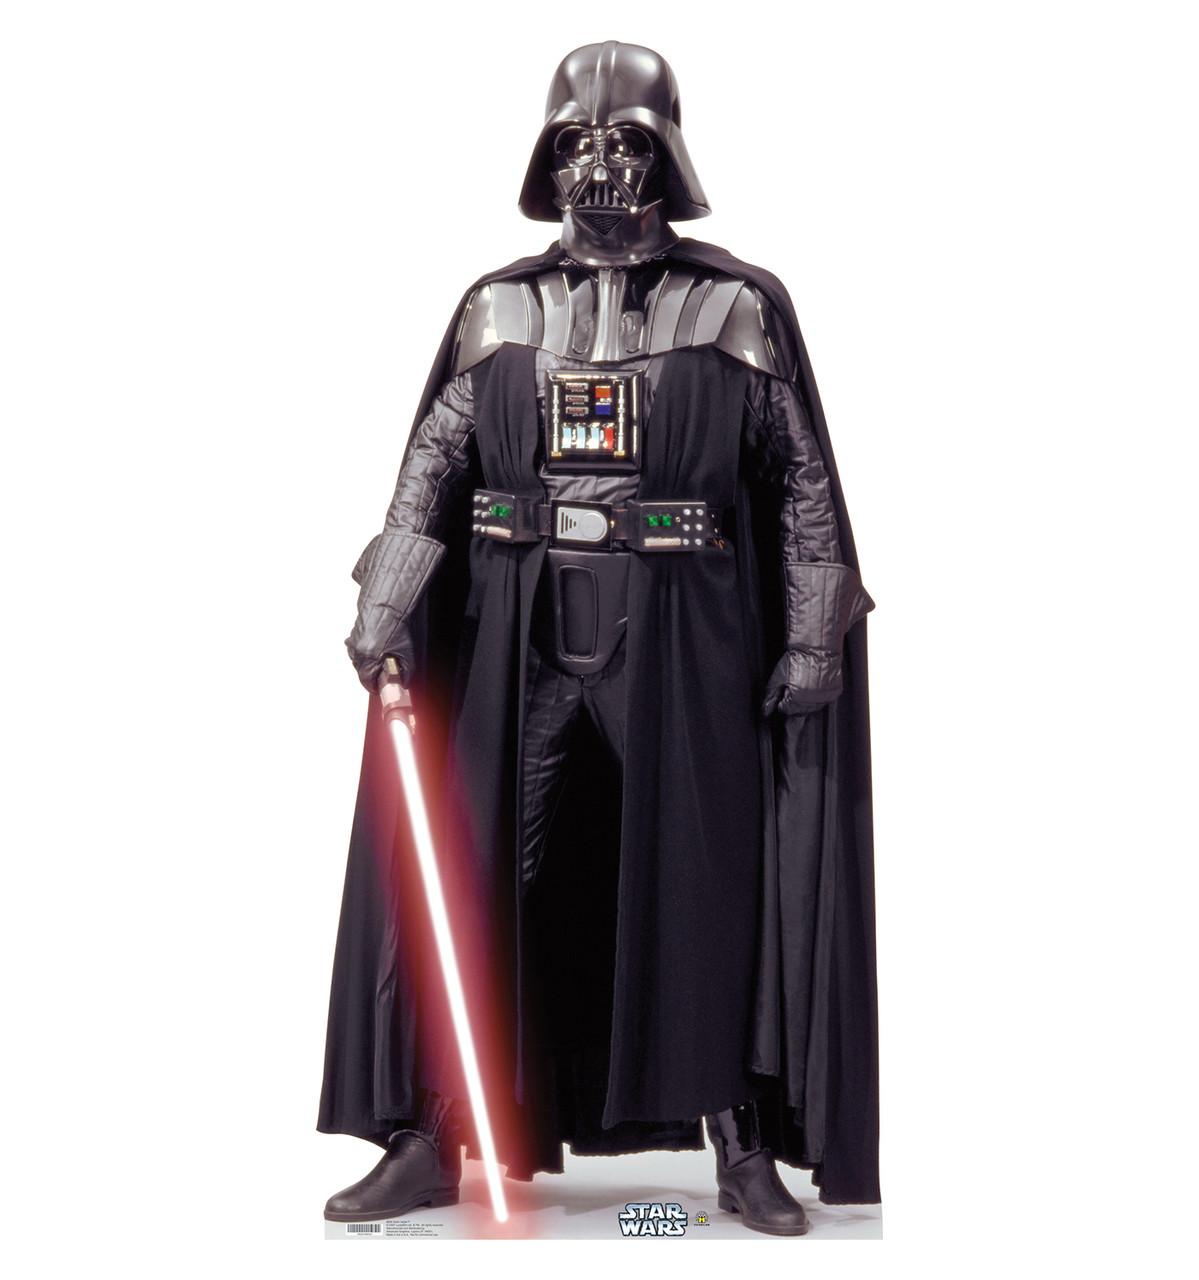 Darth Vader Talking Cardboard Cutout 656T